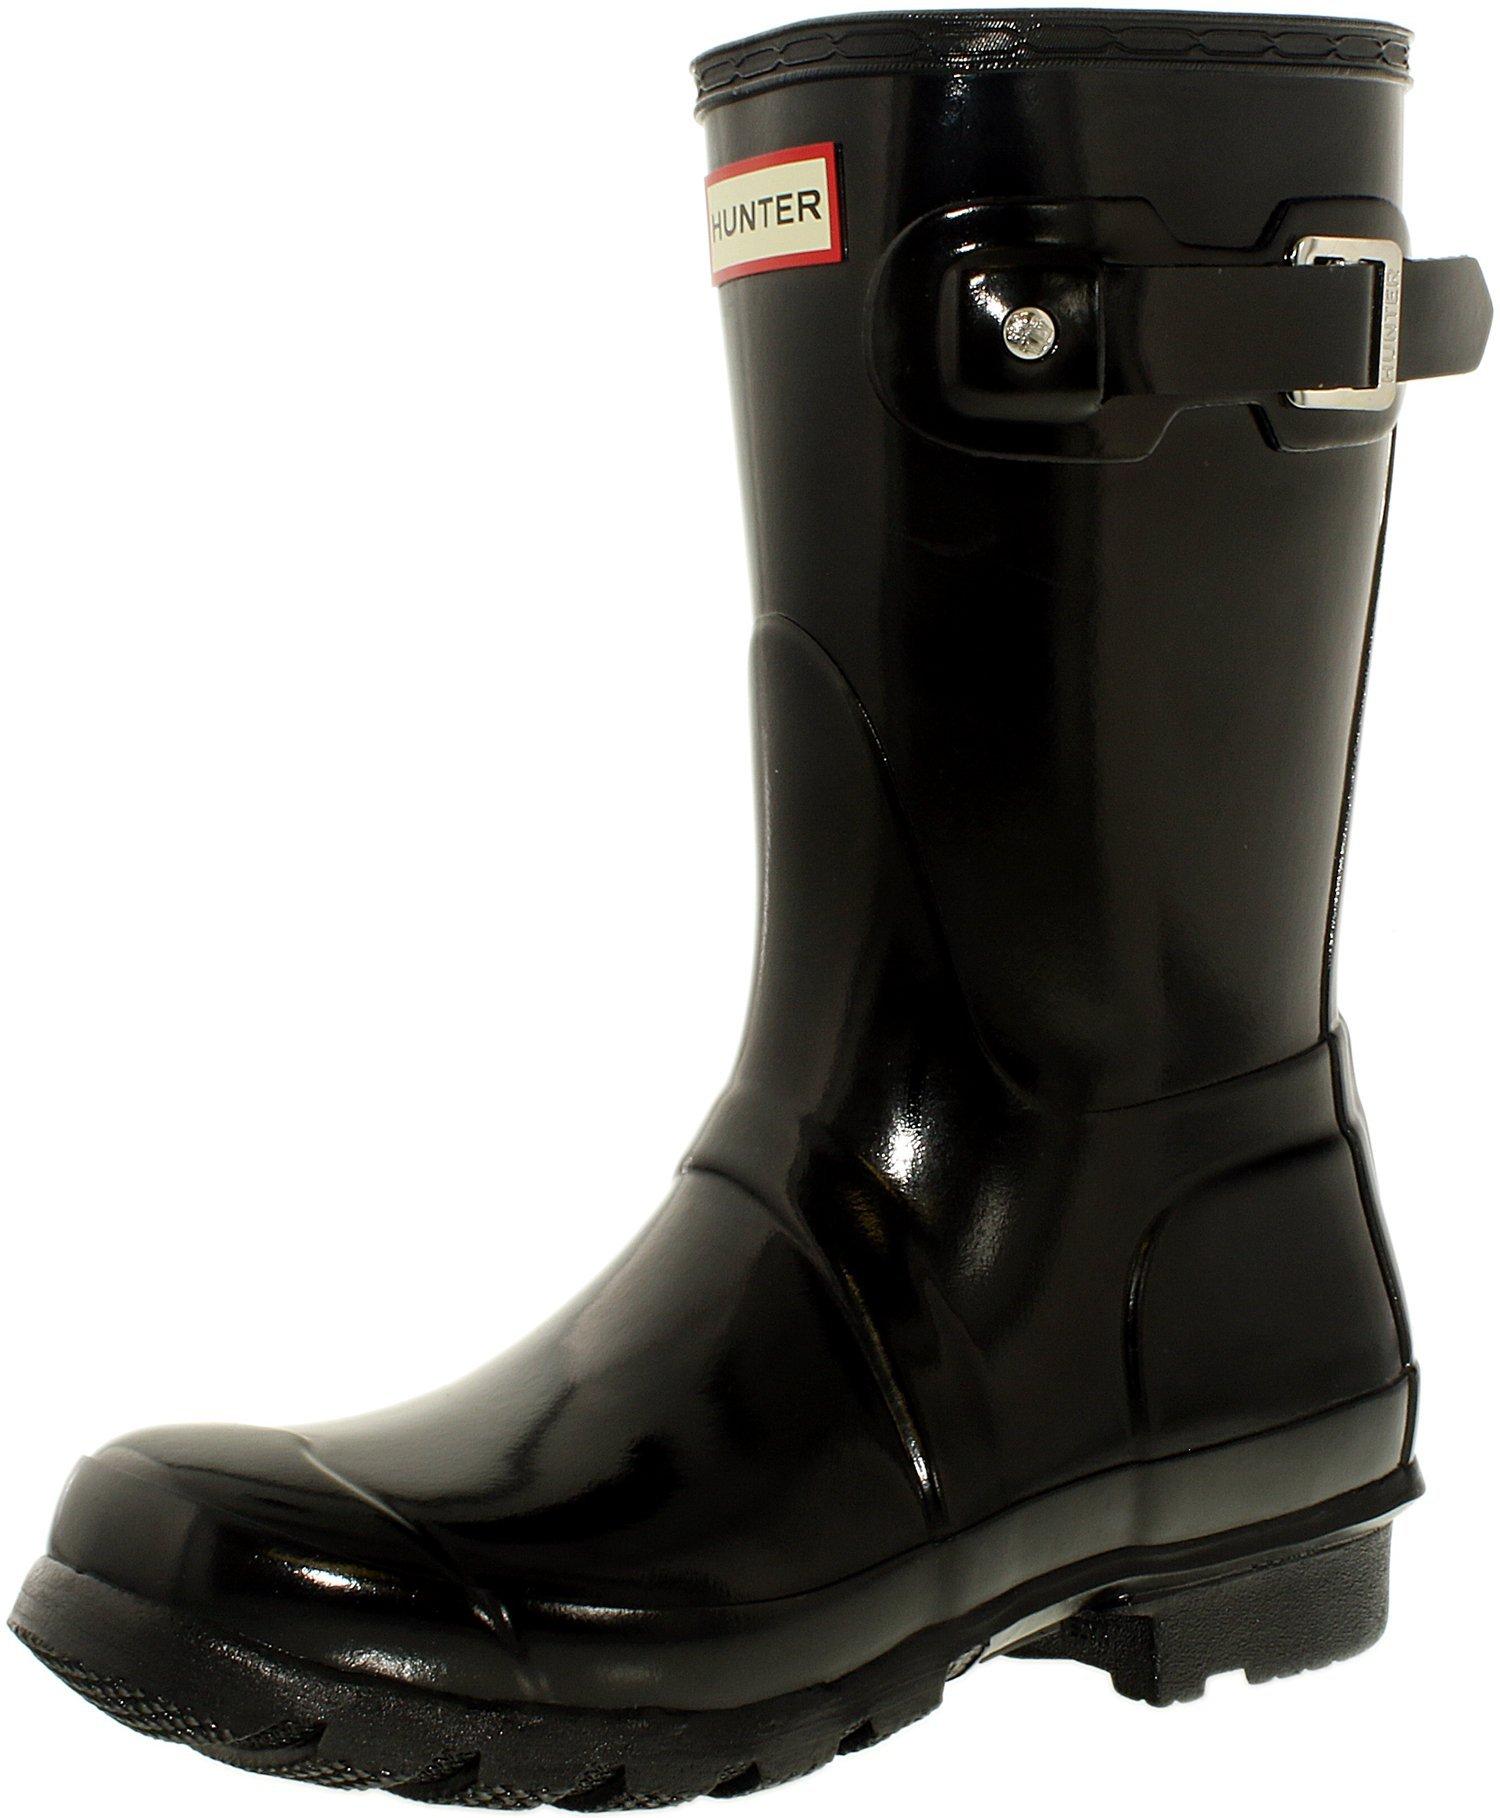 Hunter Womens Original Short Black Rain Boot - 10 B(M) US